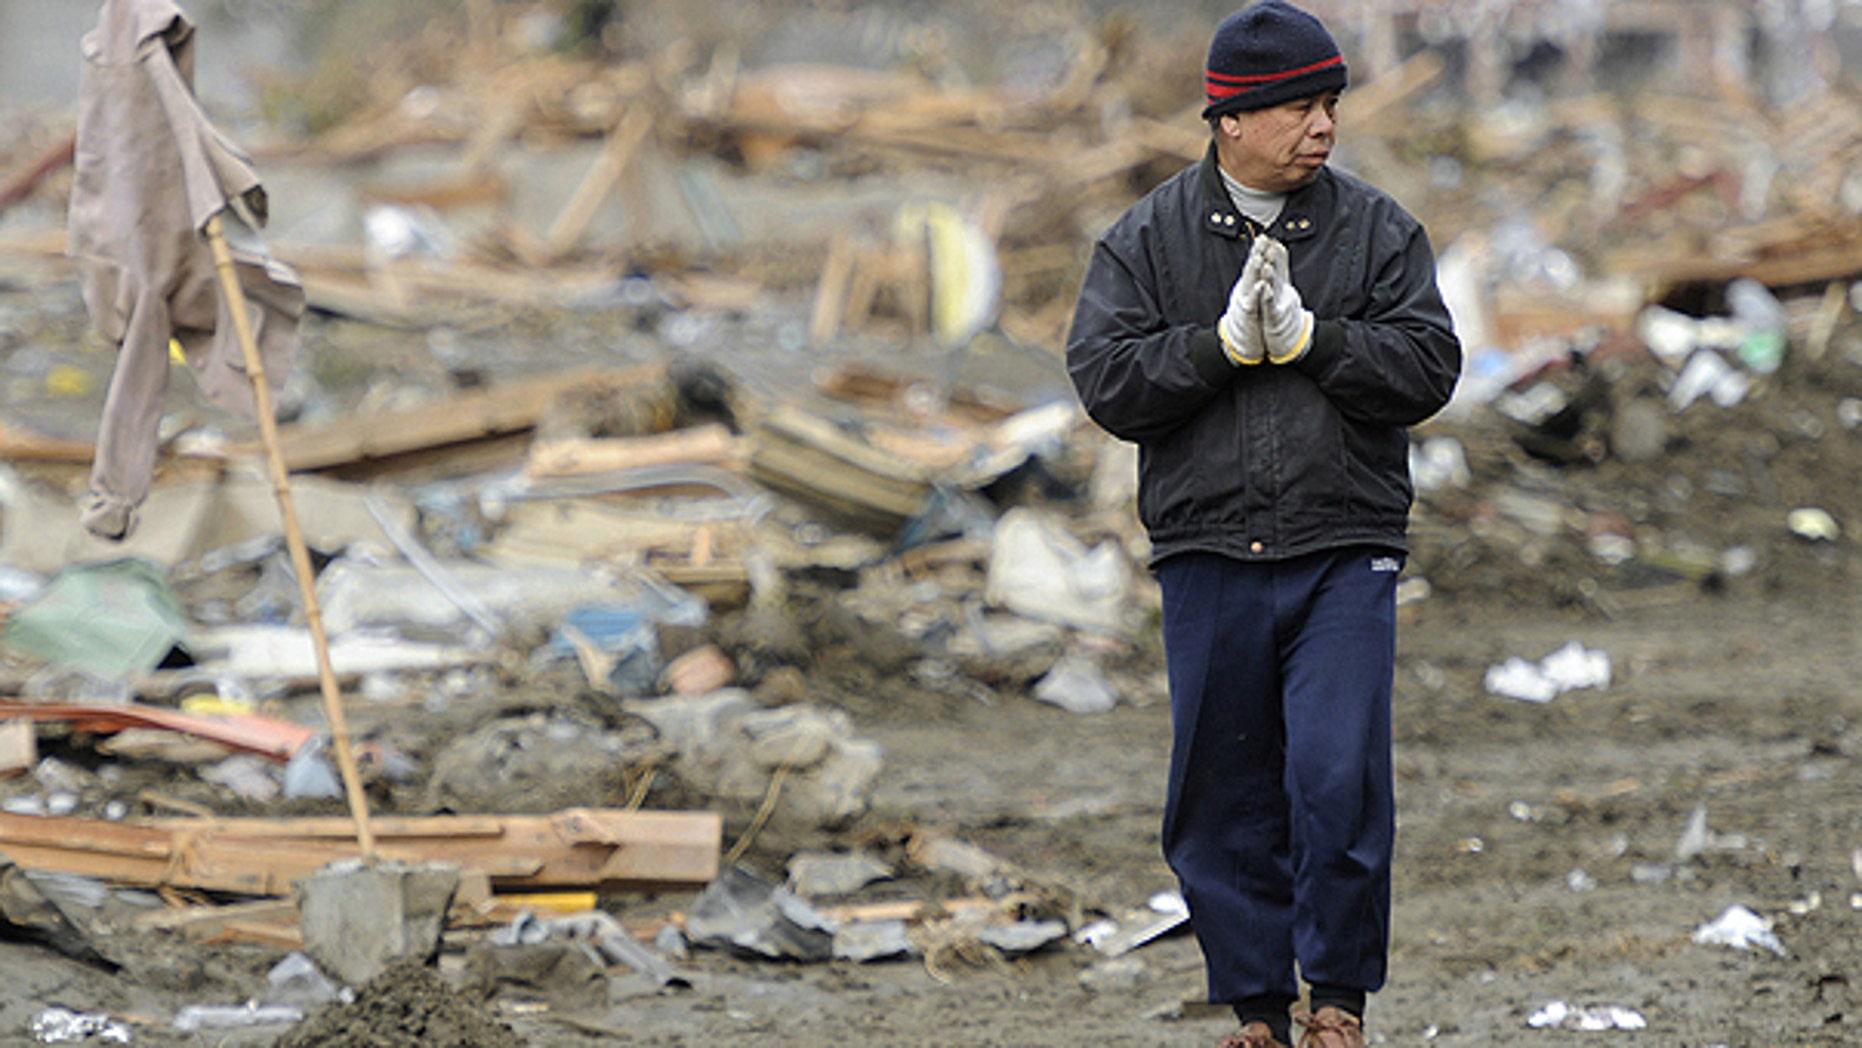 March 15: A man prays his family members at tsunami-devastated area in Rikuzentakata, Iwate prefecture, Japan.